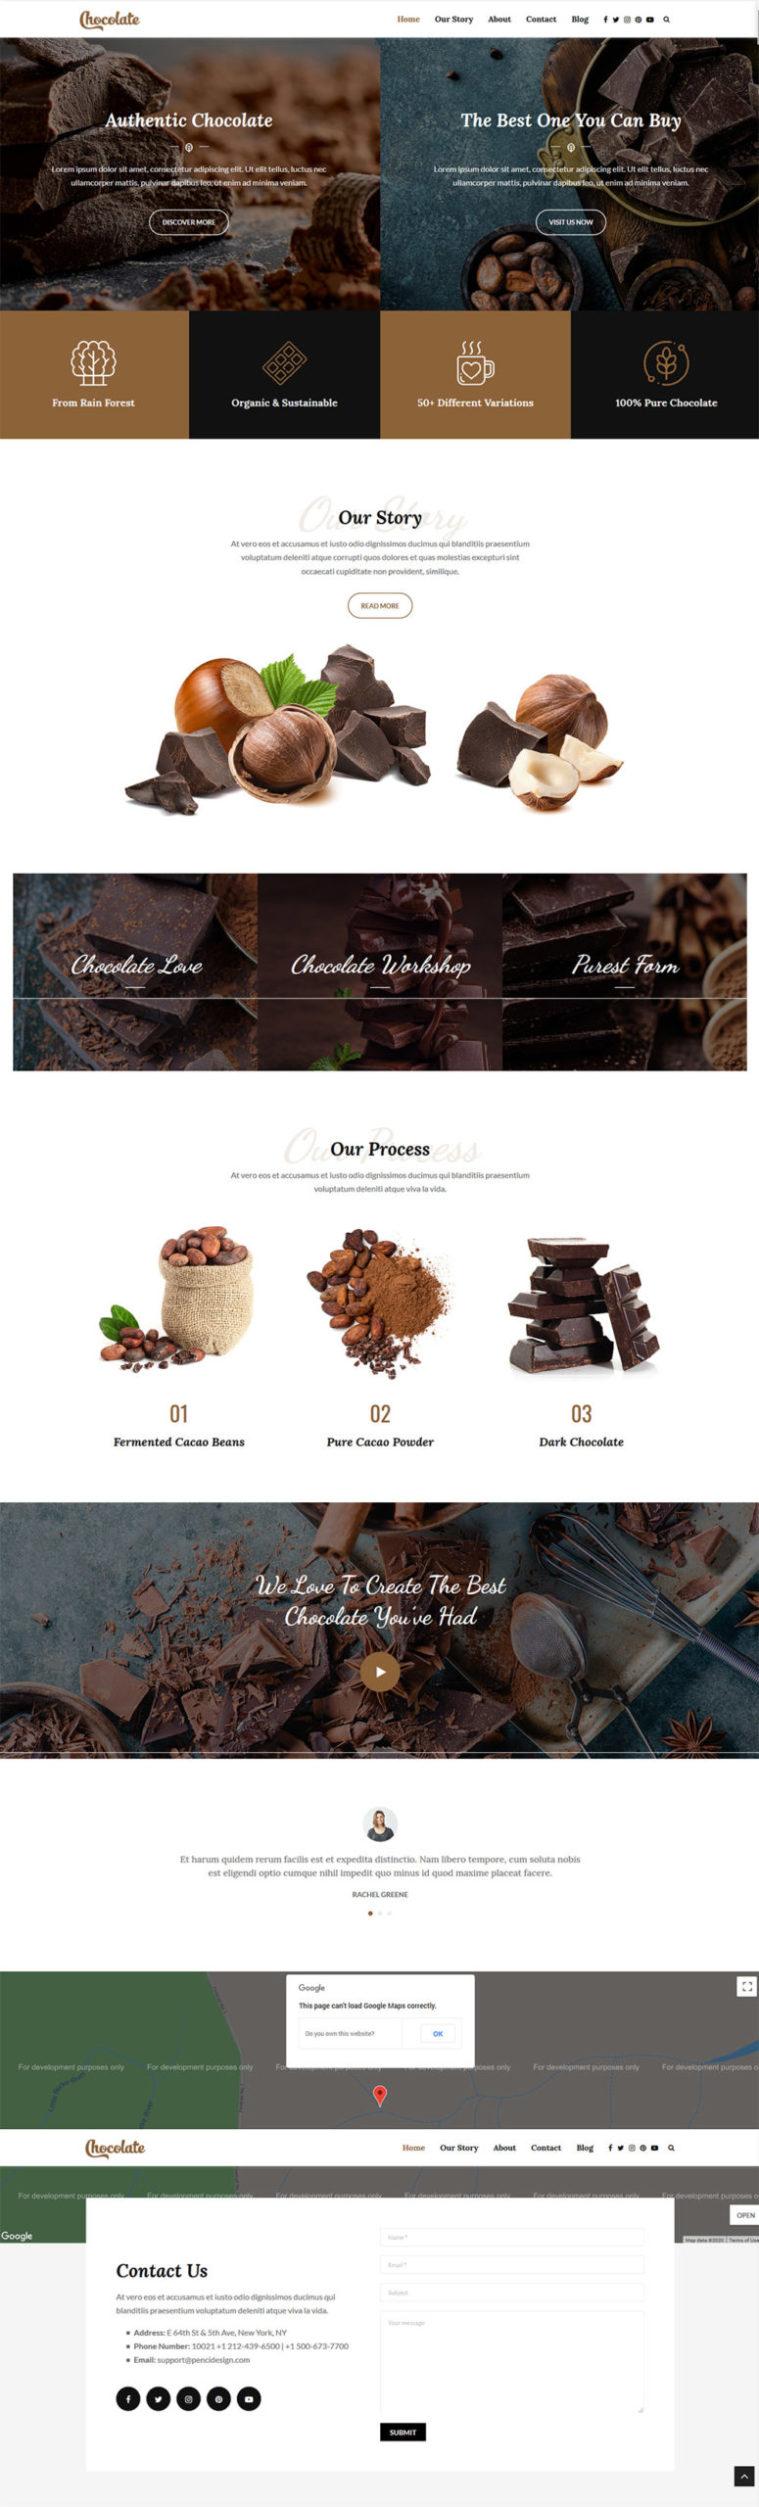 Penenws Chocolate